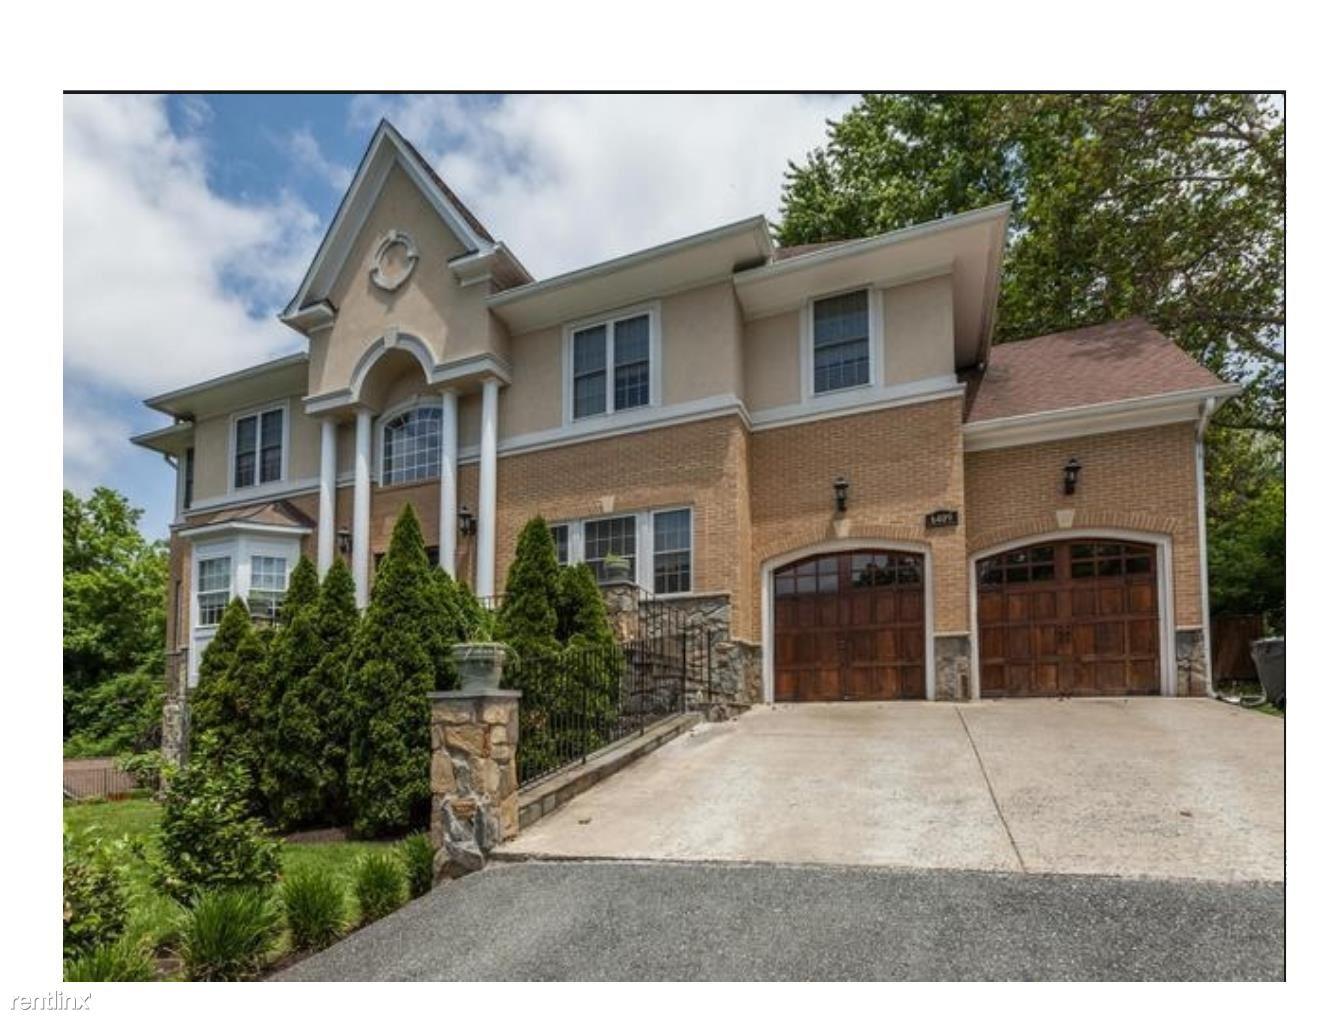 6409 Macarthur Blvd., Bethesda, MD - $5,200